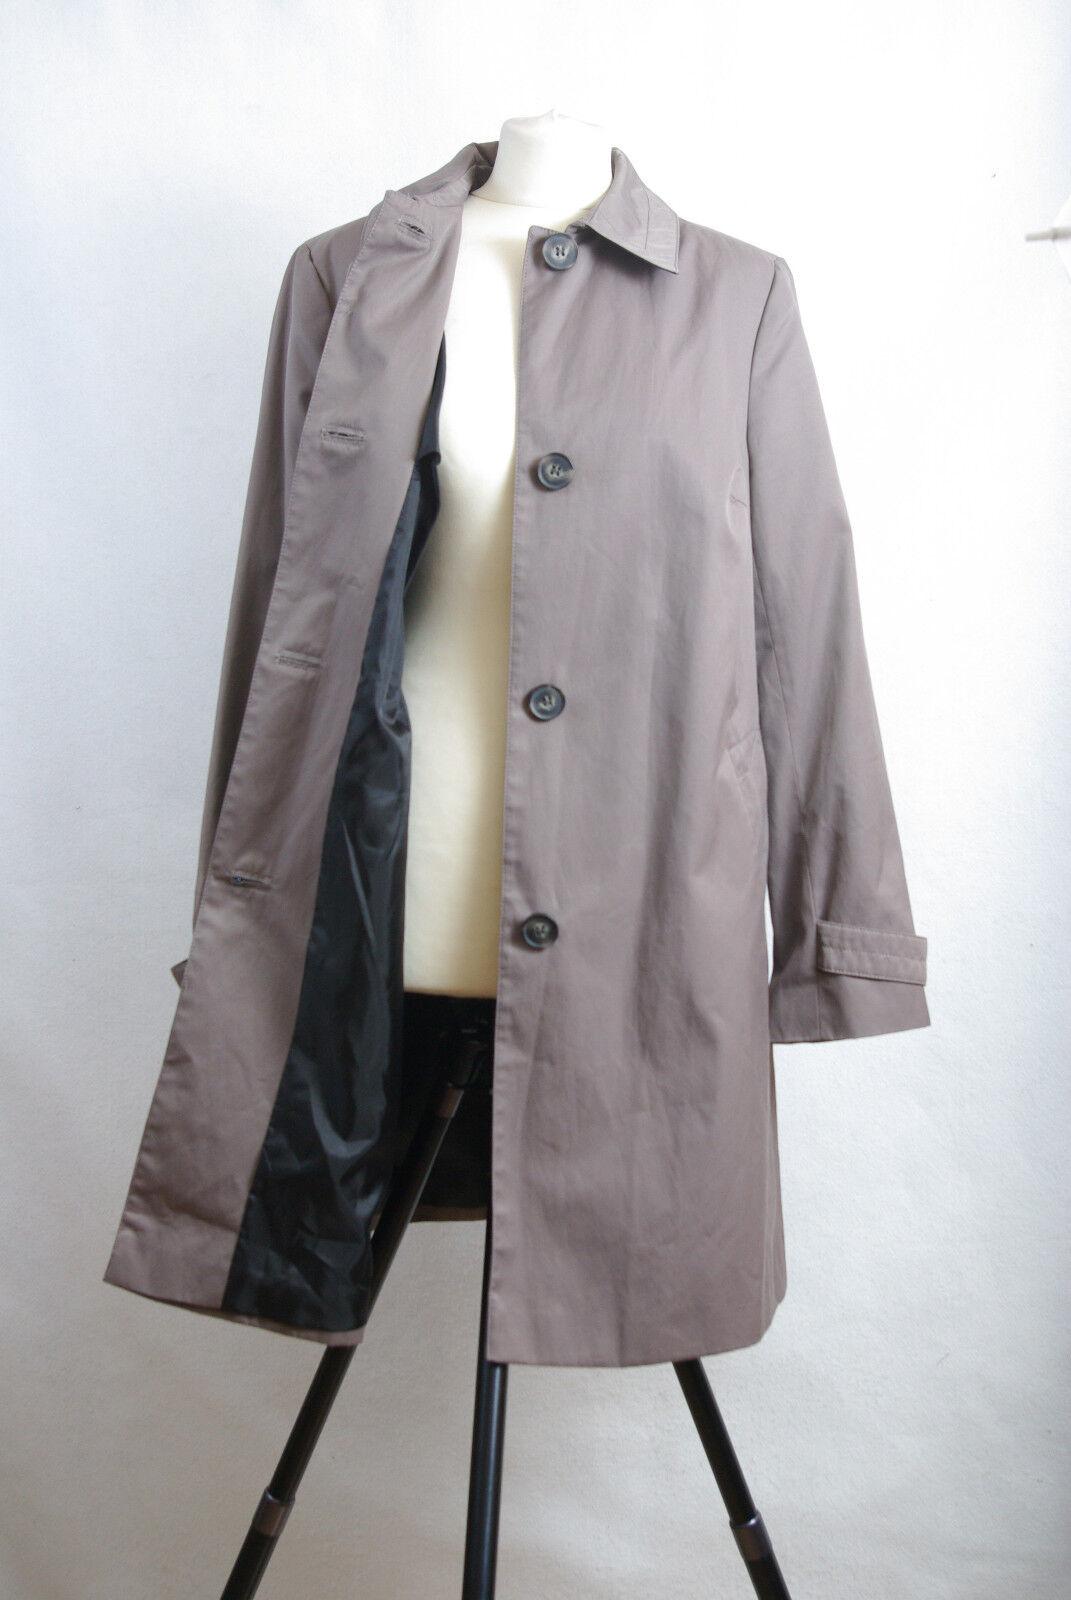 P645 75 The Collection Debenhams Stone Rain Coat UK14 Eur Eur Eur 42 f53be1